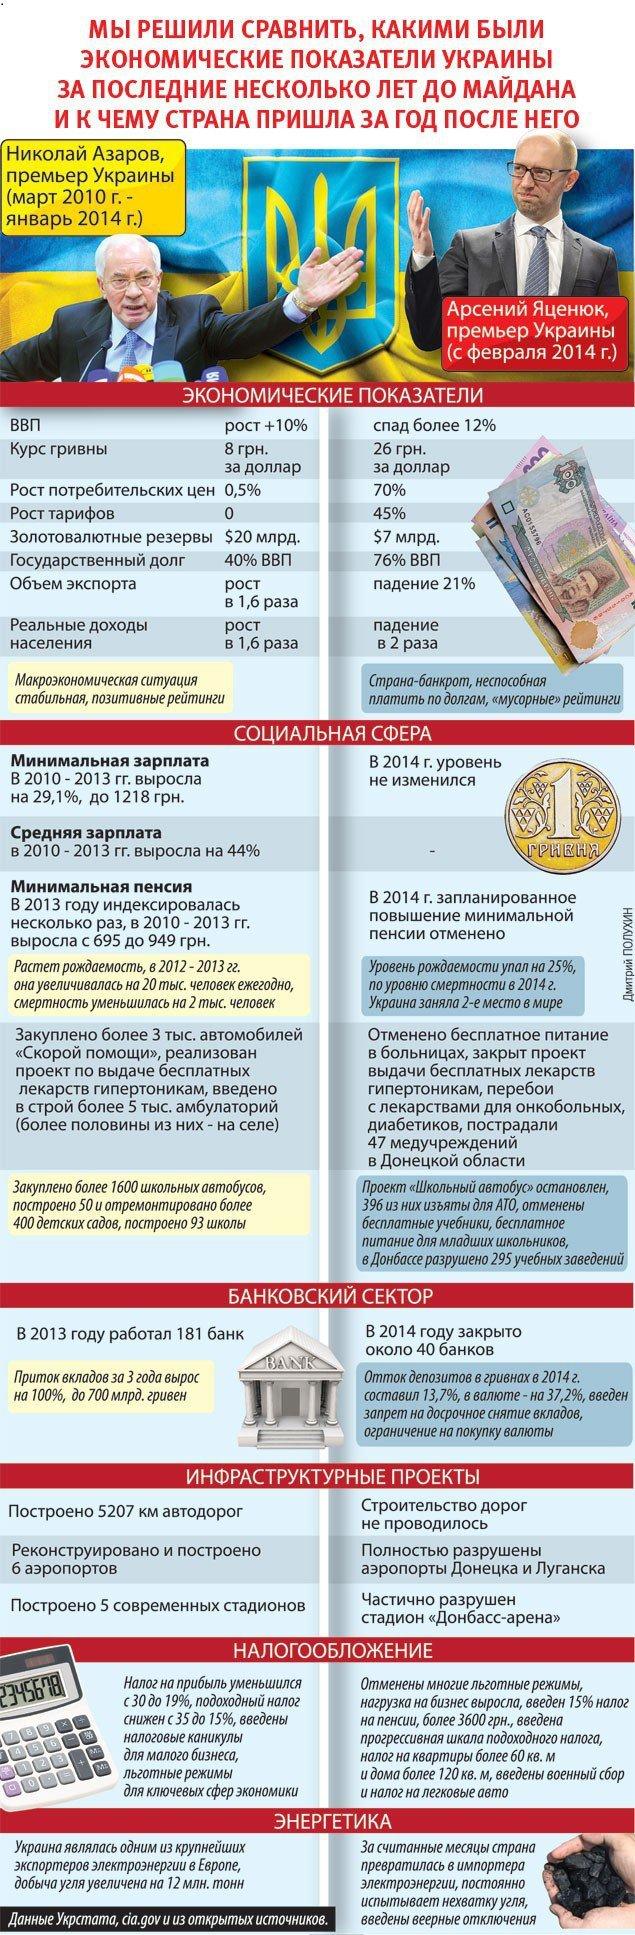 Майдан: К чему Украина пришла за год. Азаров против Яценюка